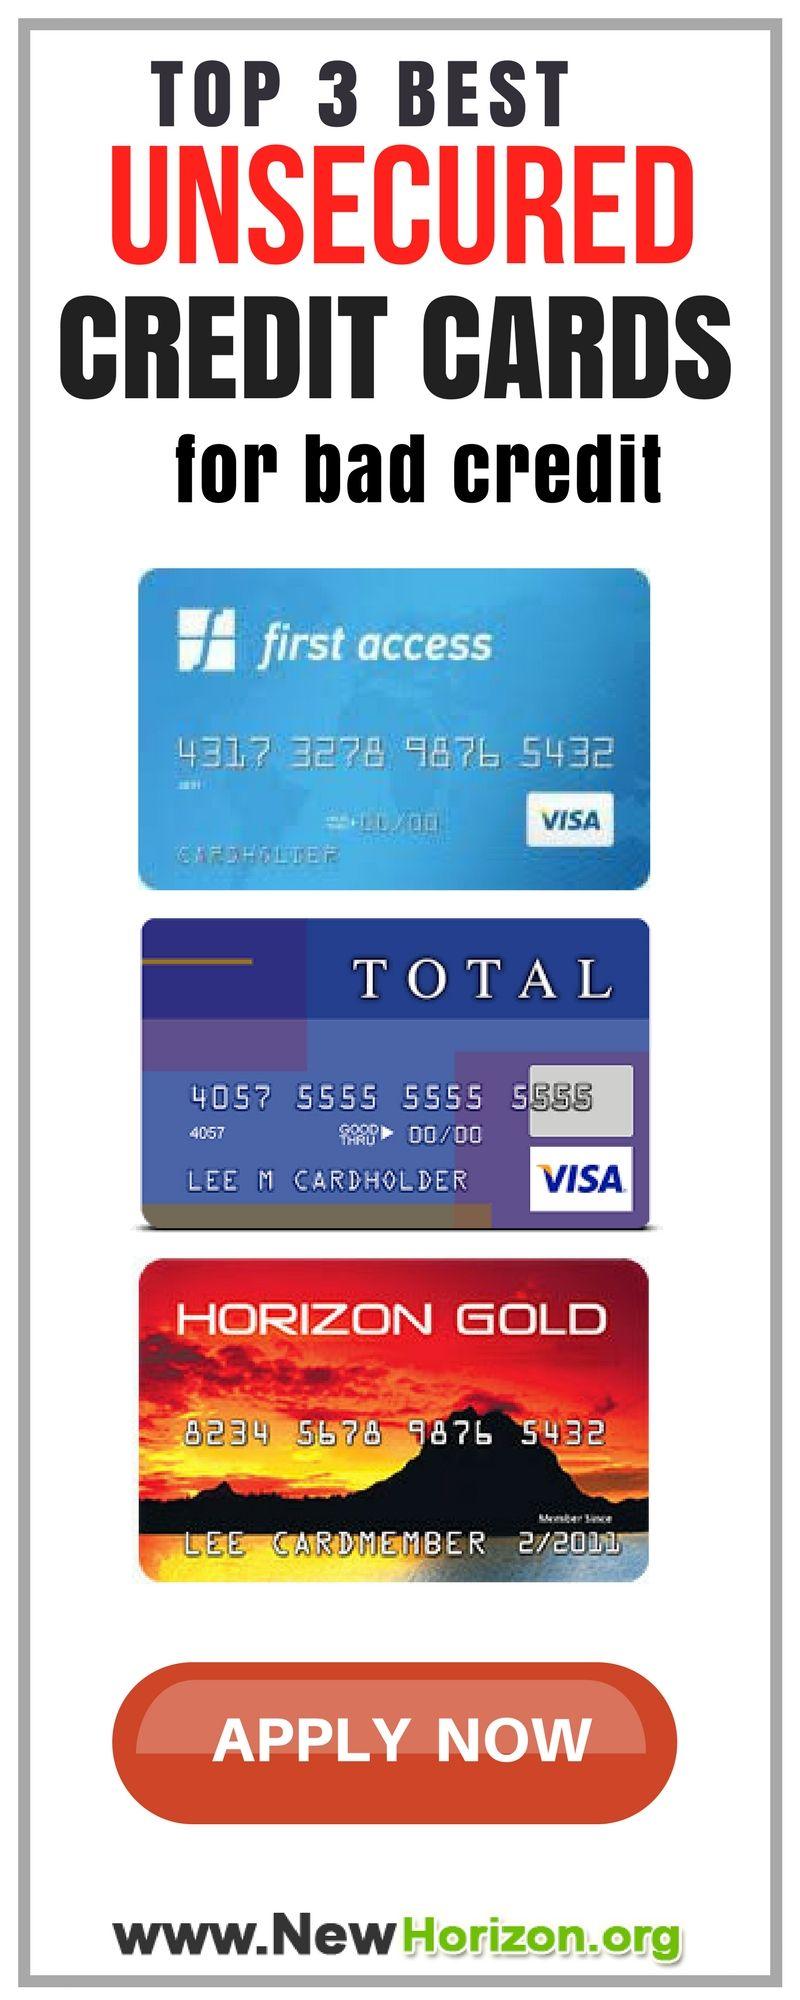 Credit Card Offers For Bad Credit >> Unsecured Credit Cards Bad No Credit Bankruptcy O K Bad Credit